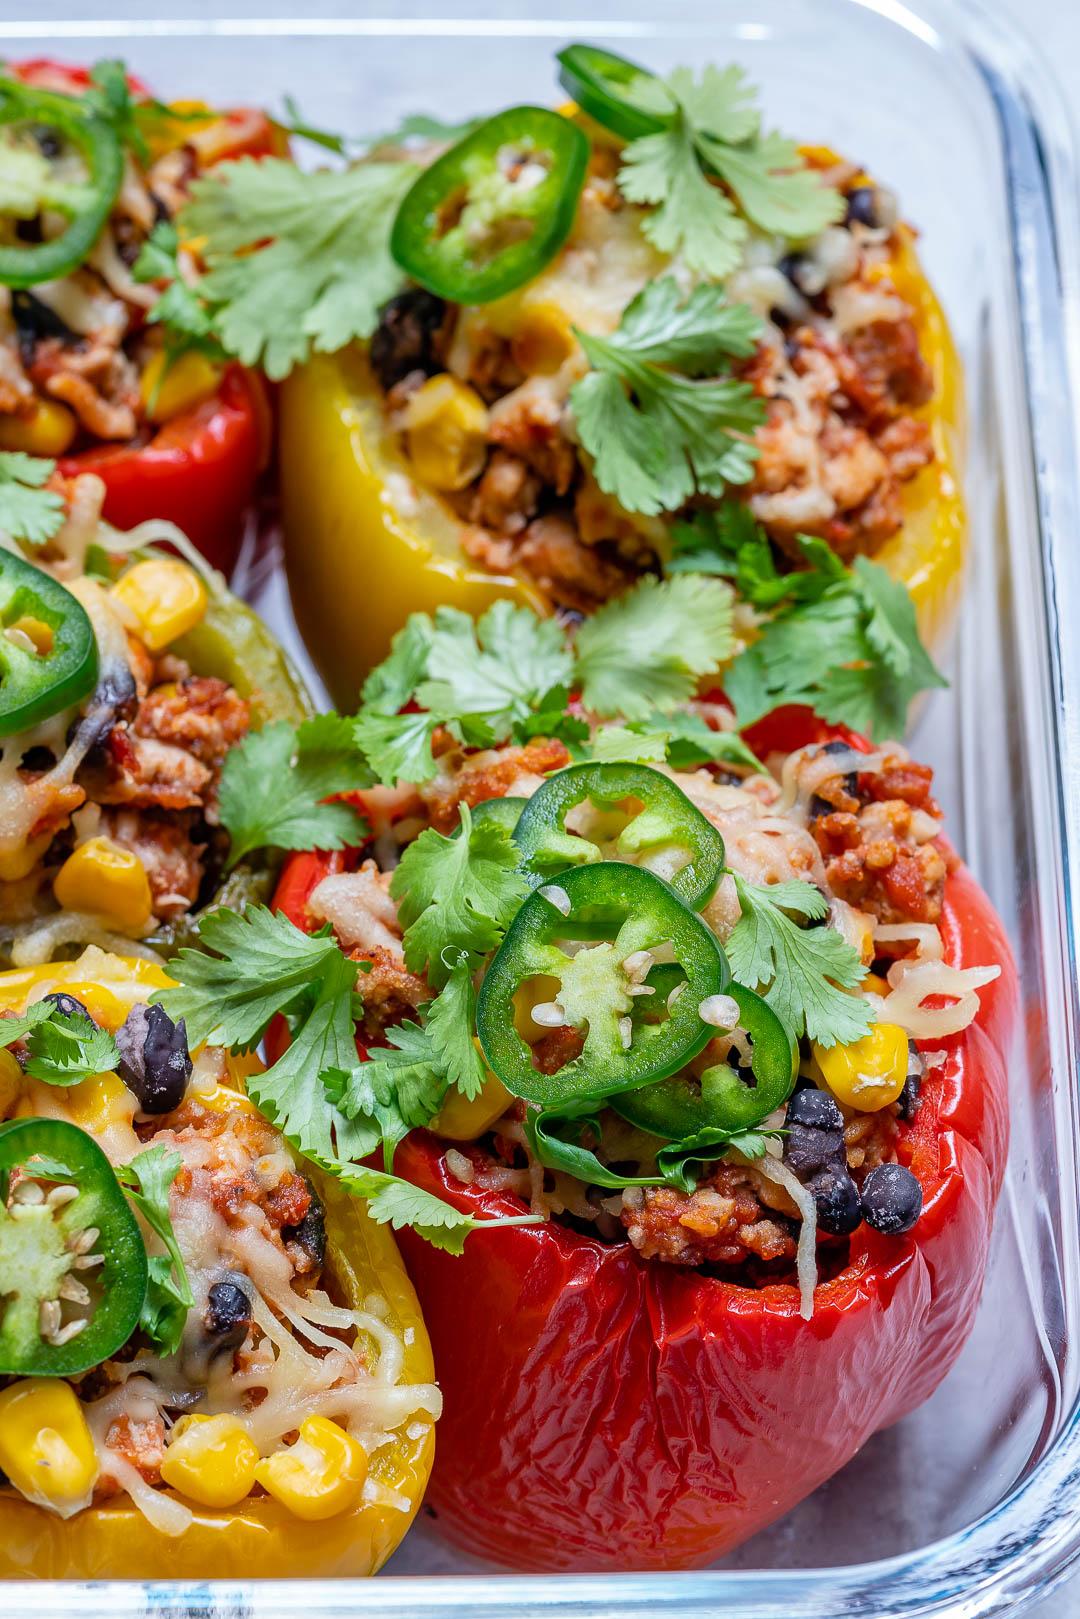 Stuffed Burrito Simple Food Prep Recipes